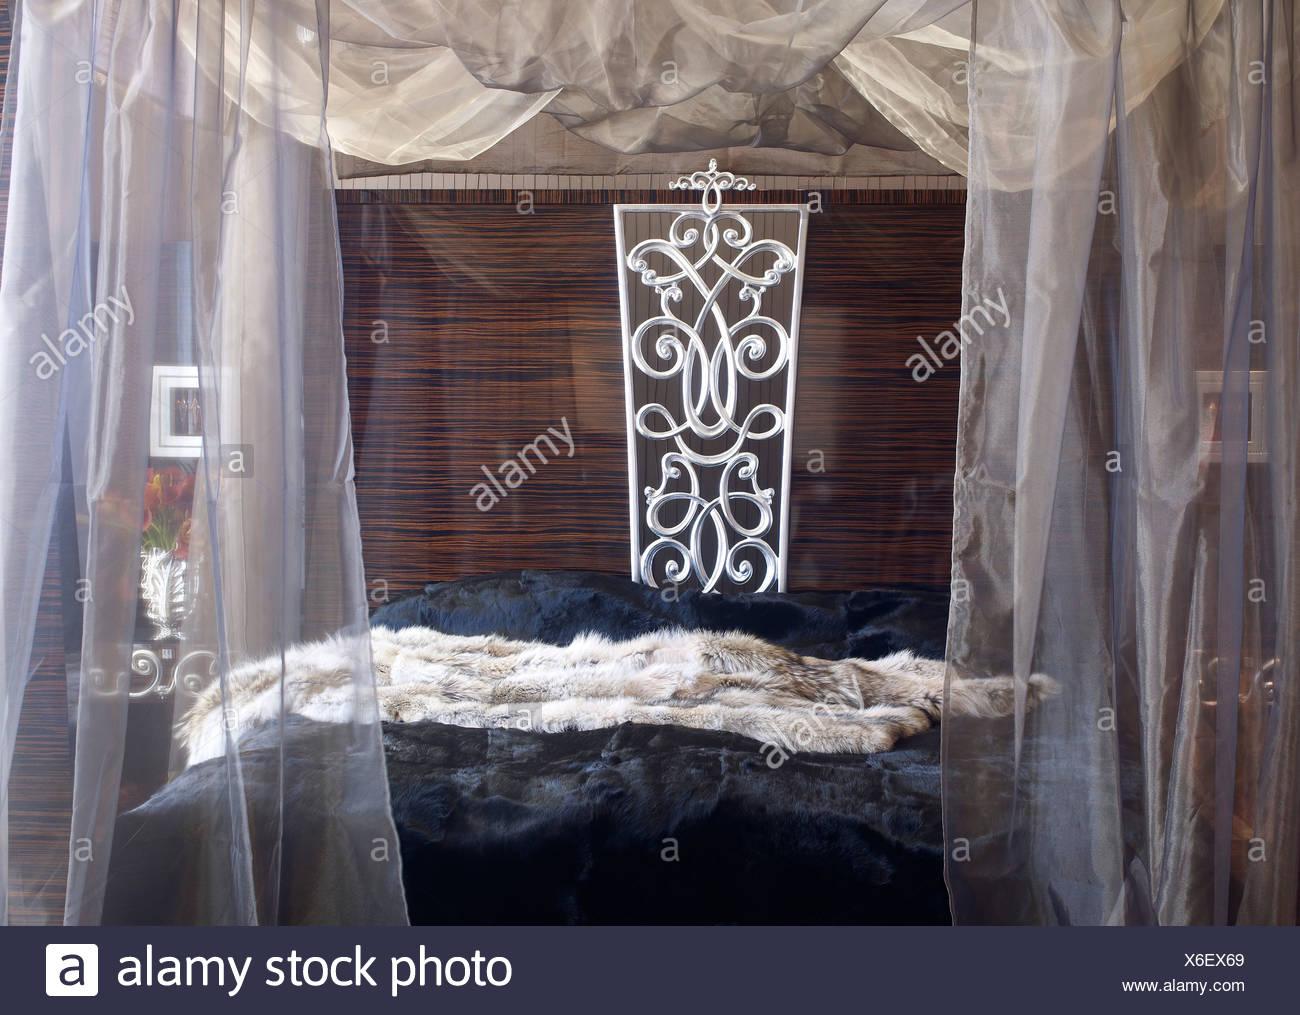 Luxurious Dubai-style bed - Stock Image